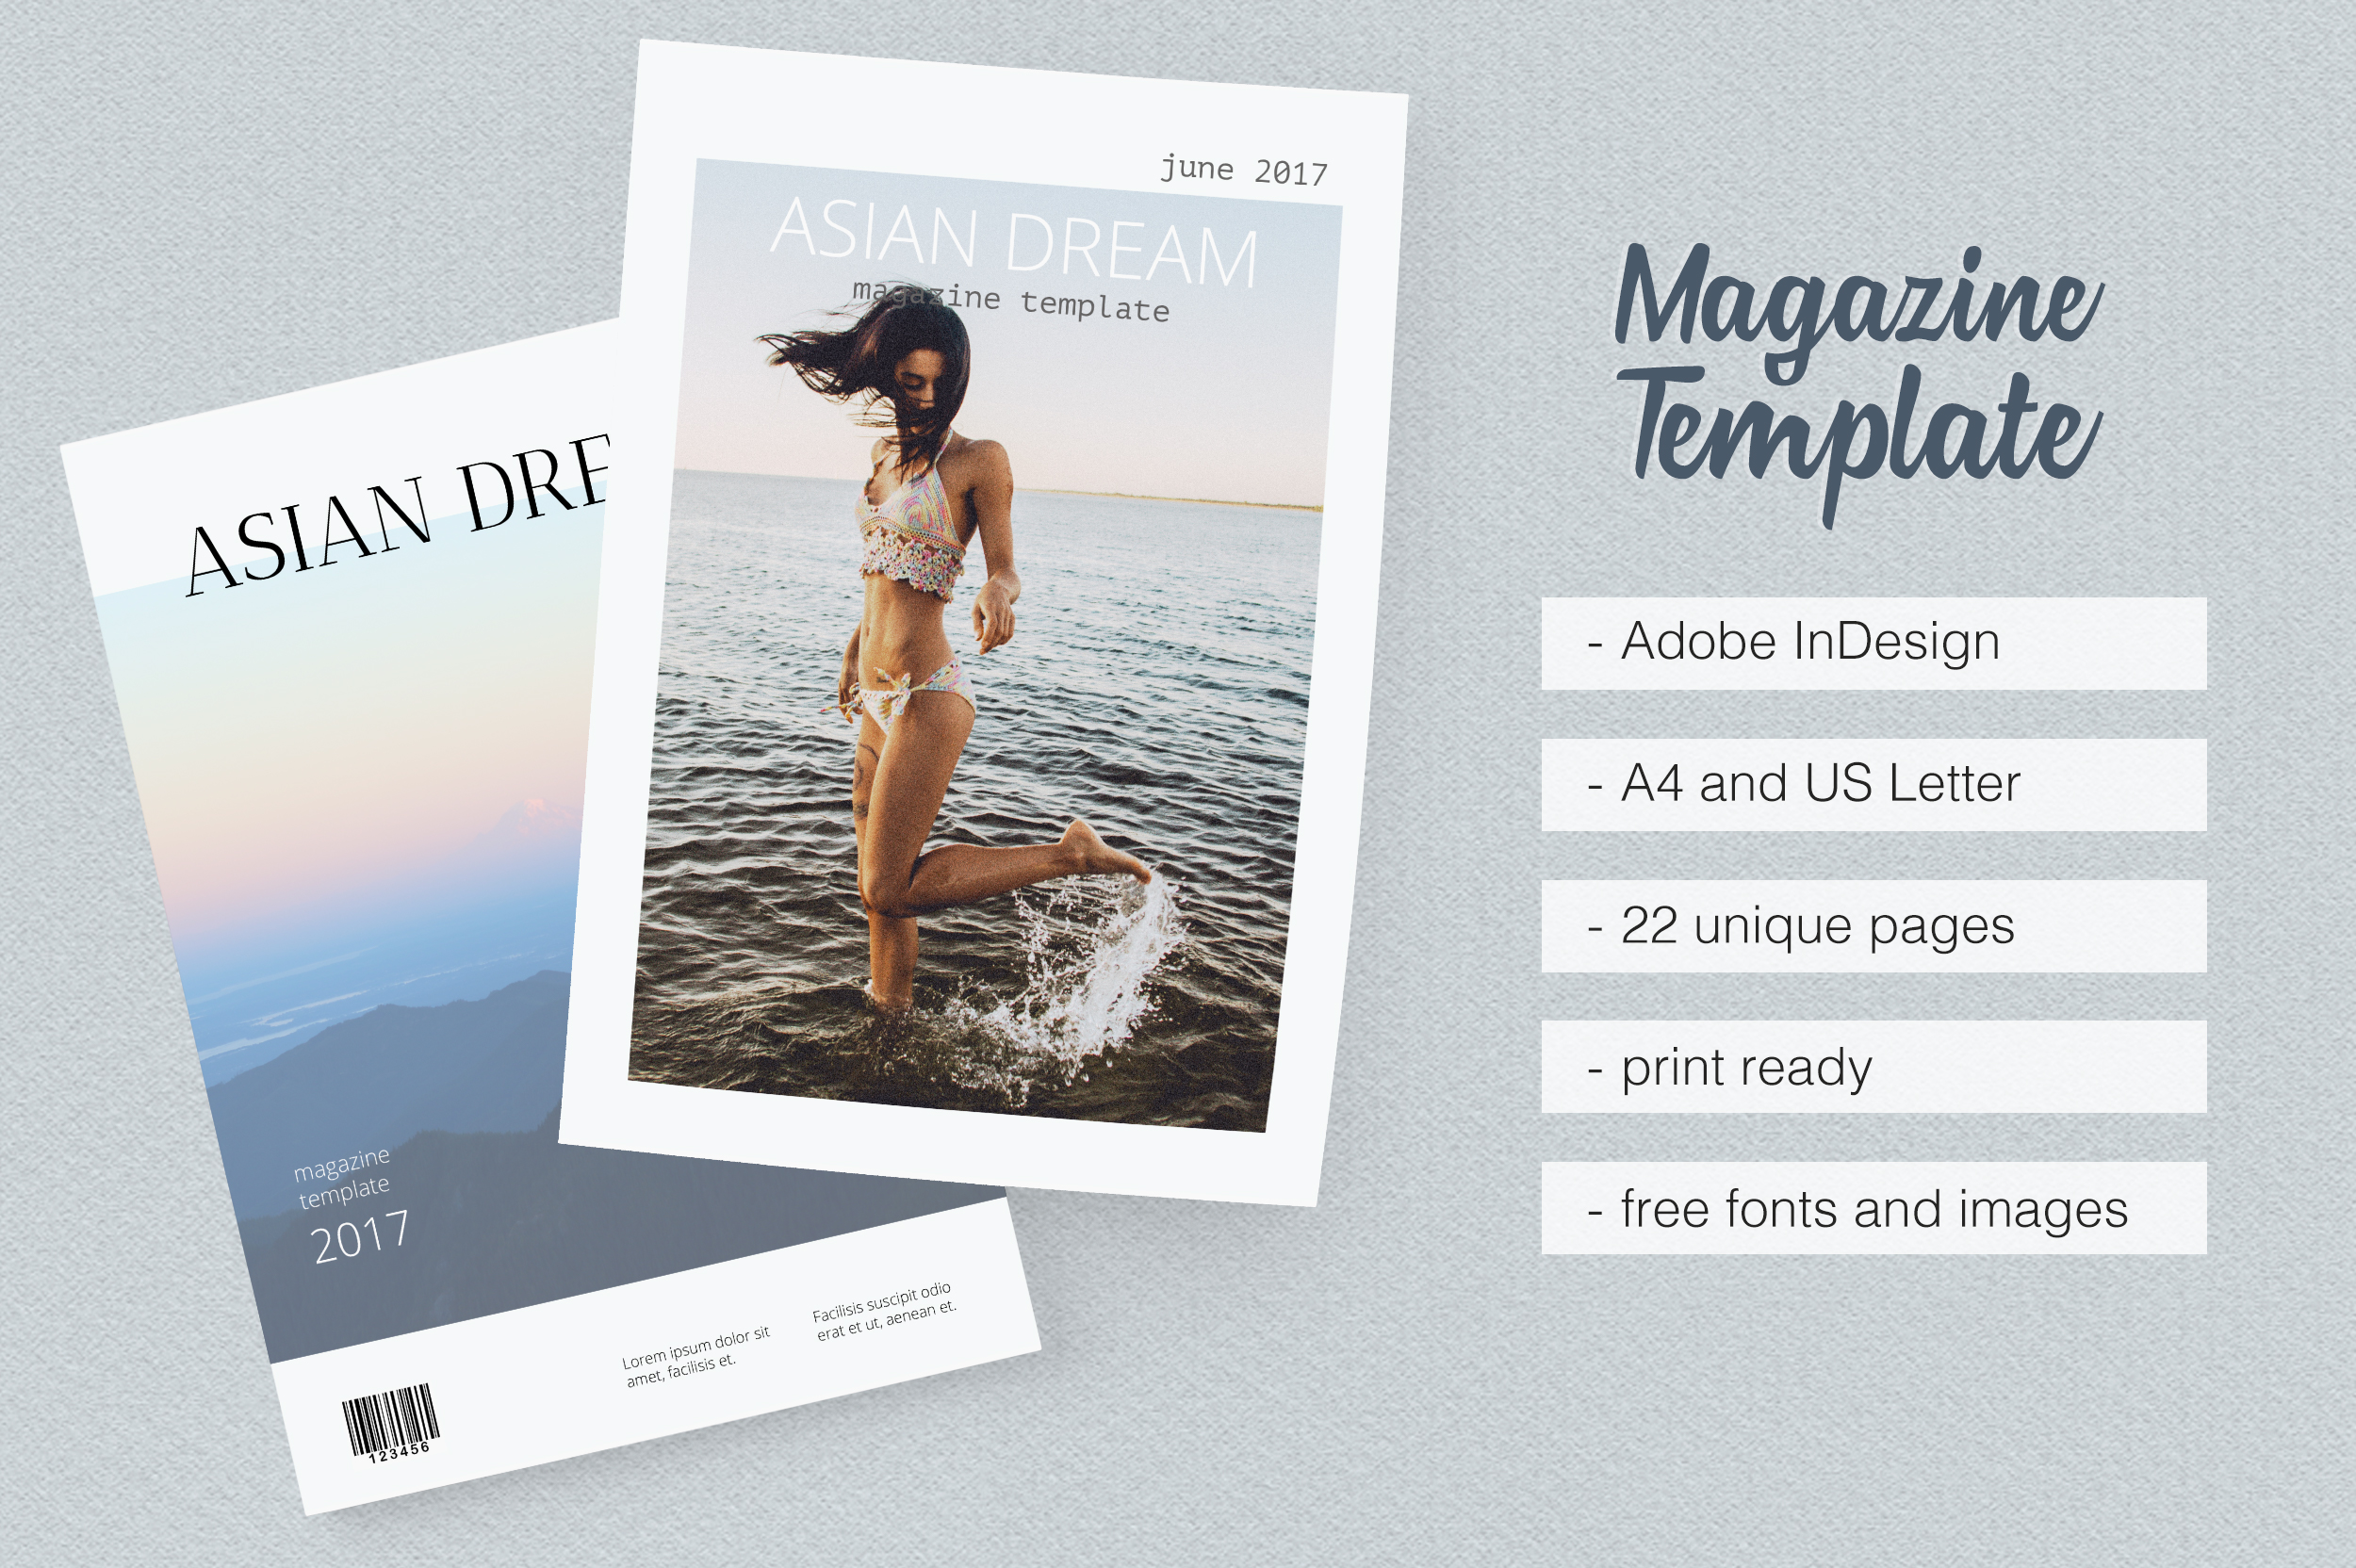 Asian Dream Magazine Template example image 1